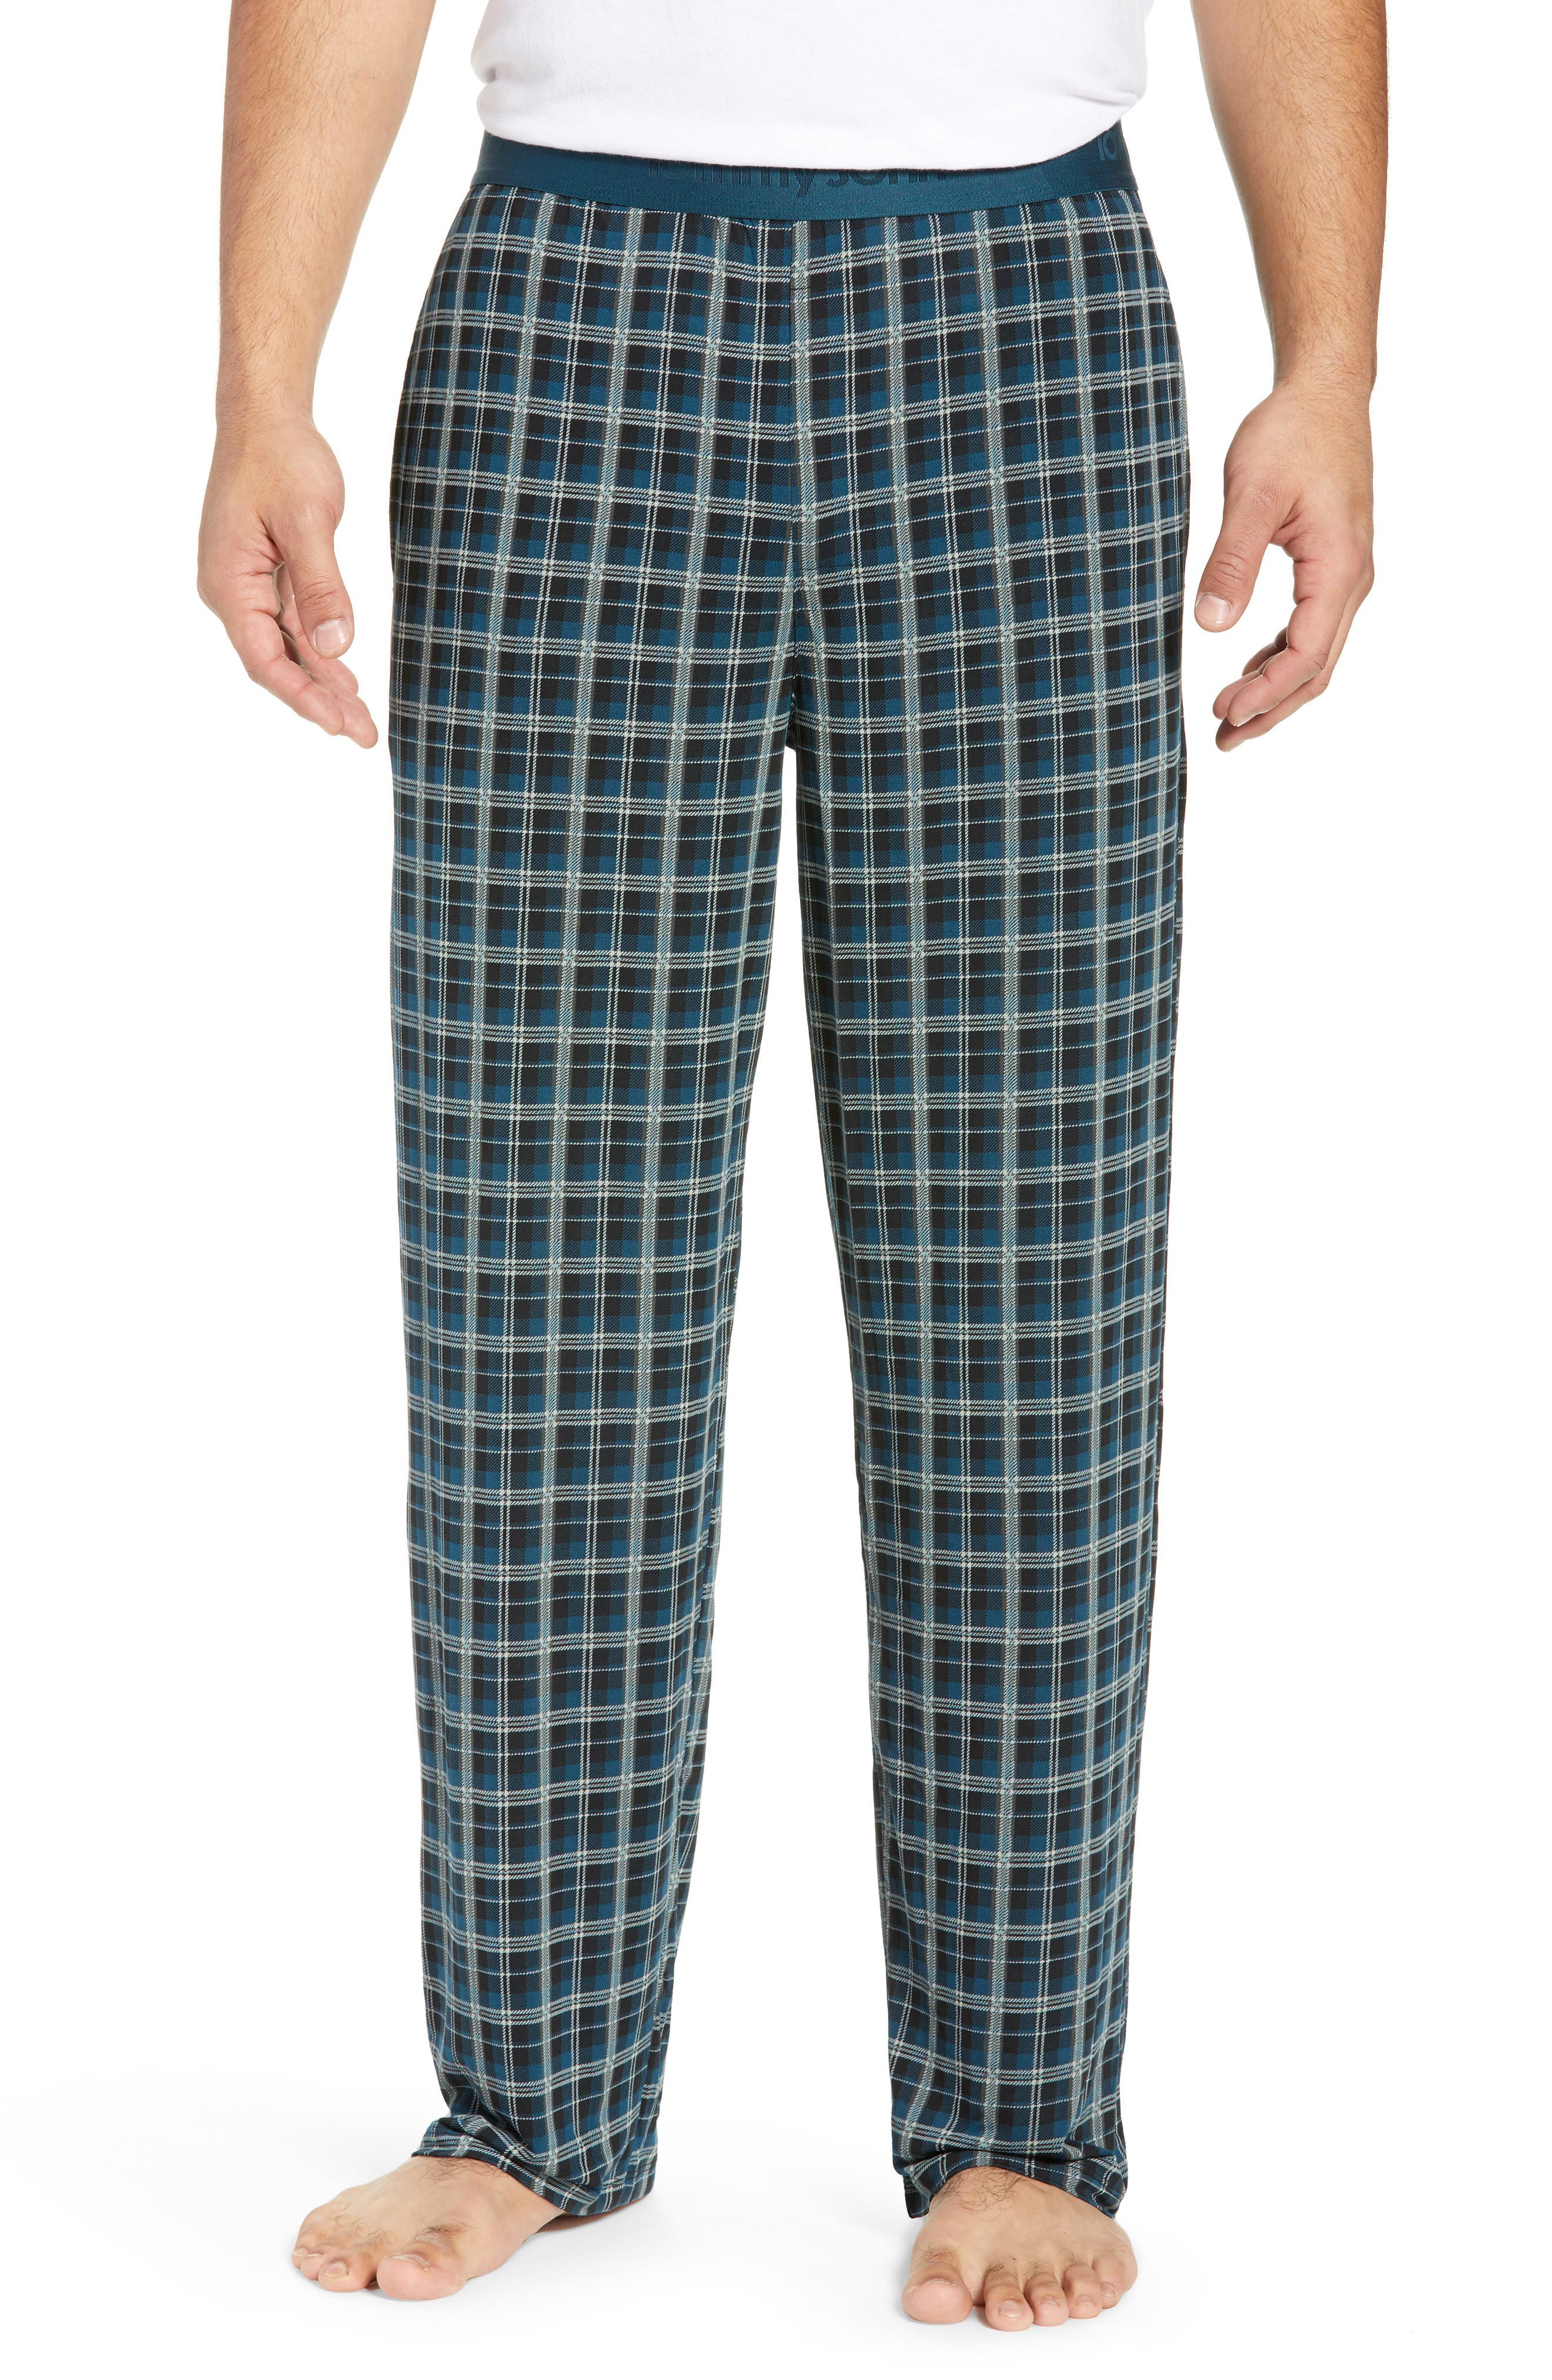 Second Skin Stretch Modal Pajama Pants,                             Main thumbnail 1, color,                             REFLECTING POND PLAID